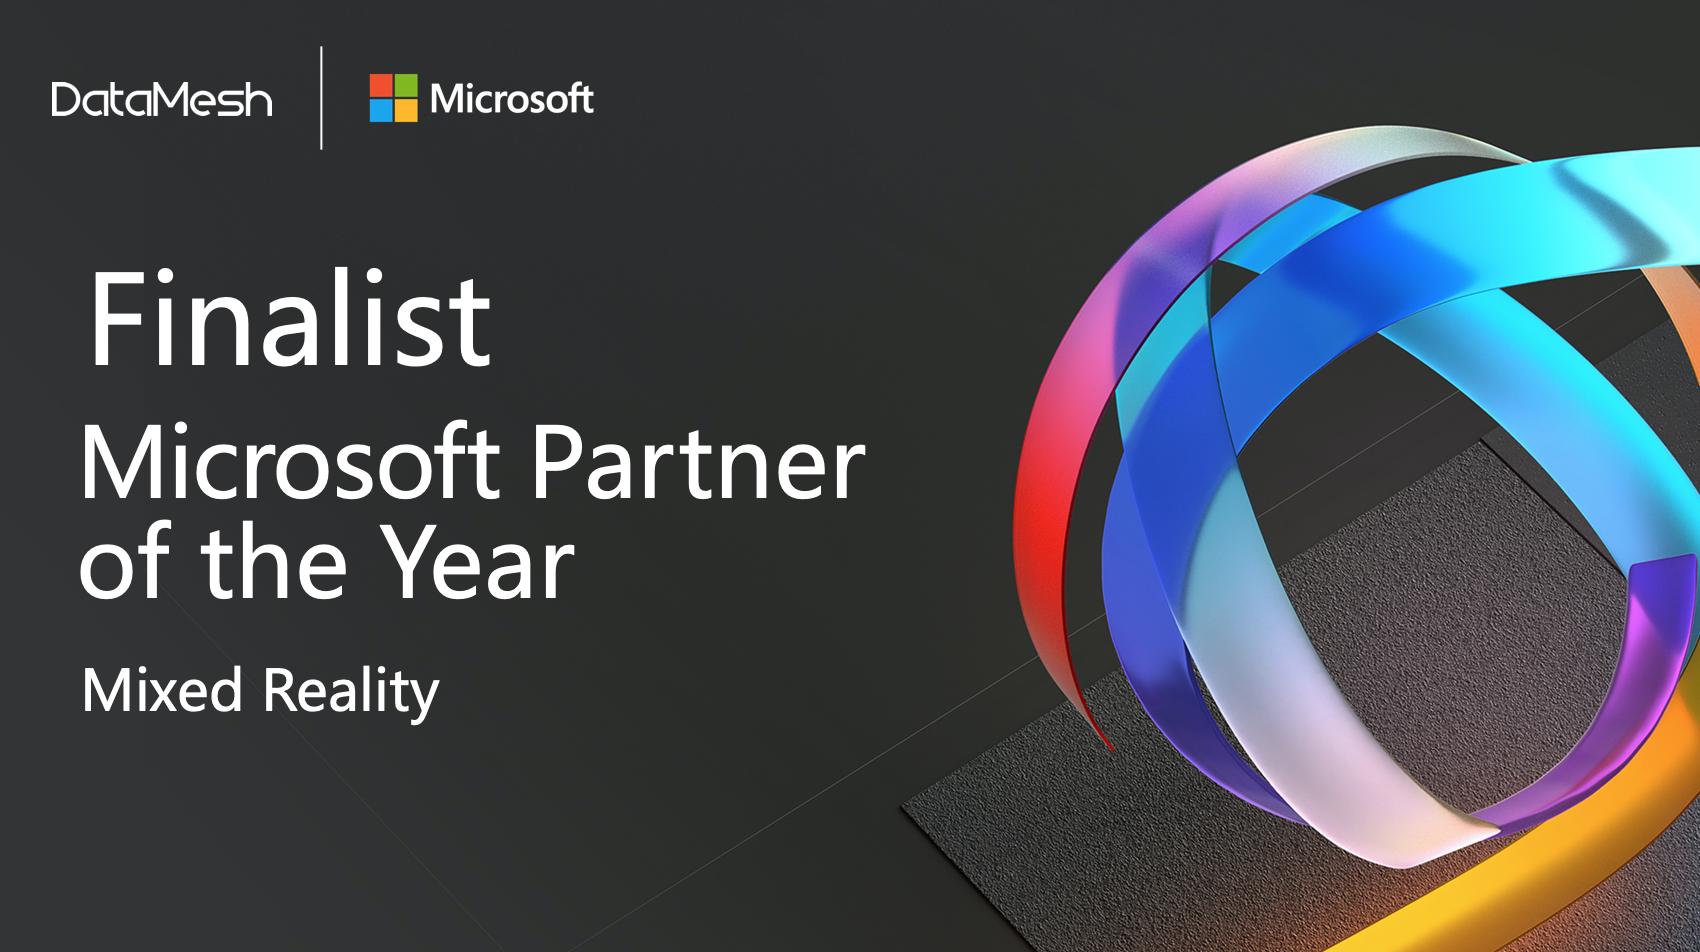 DataMesh入围2020微软年度最佳合作伙伴